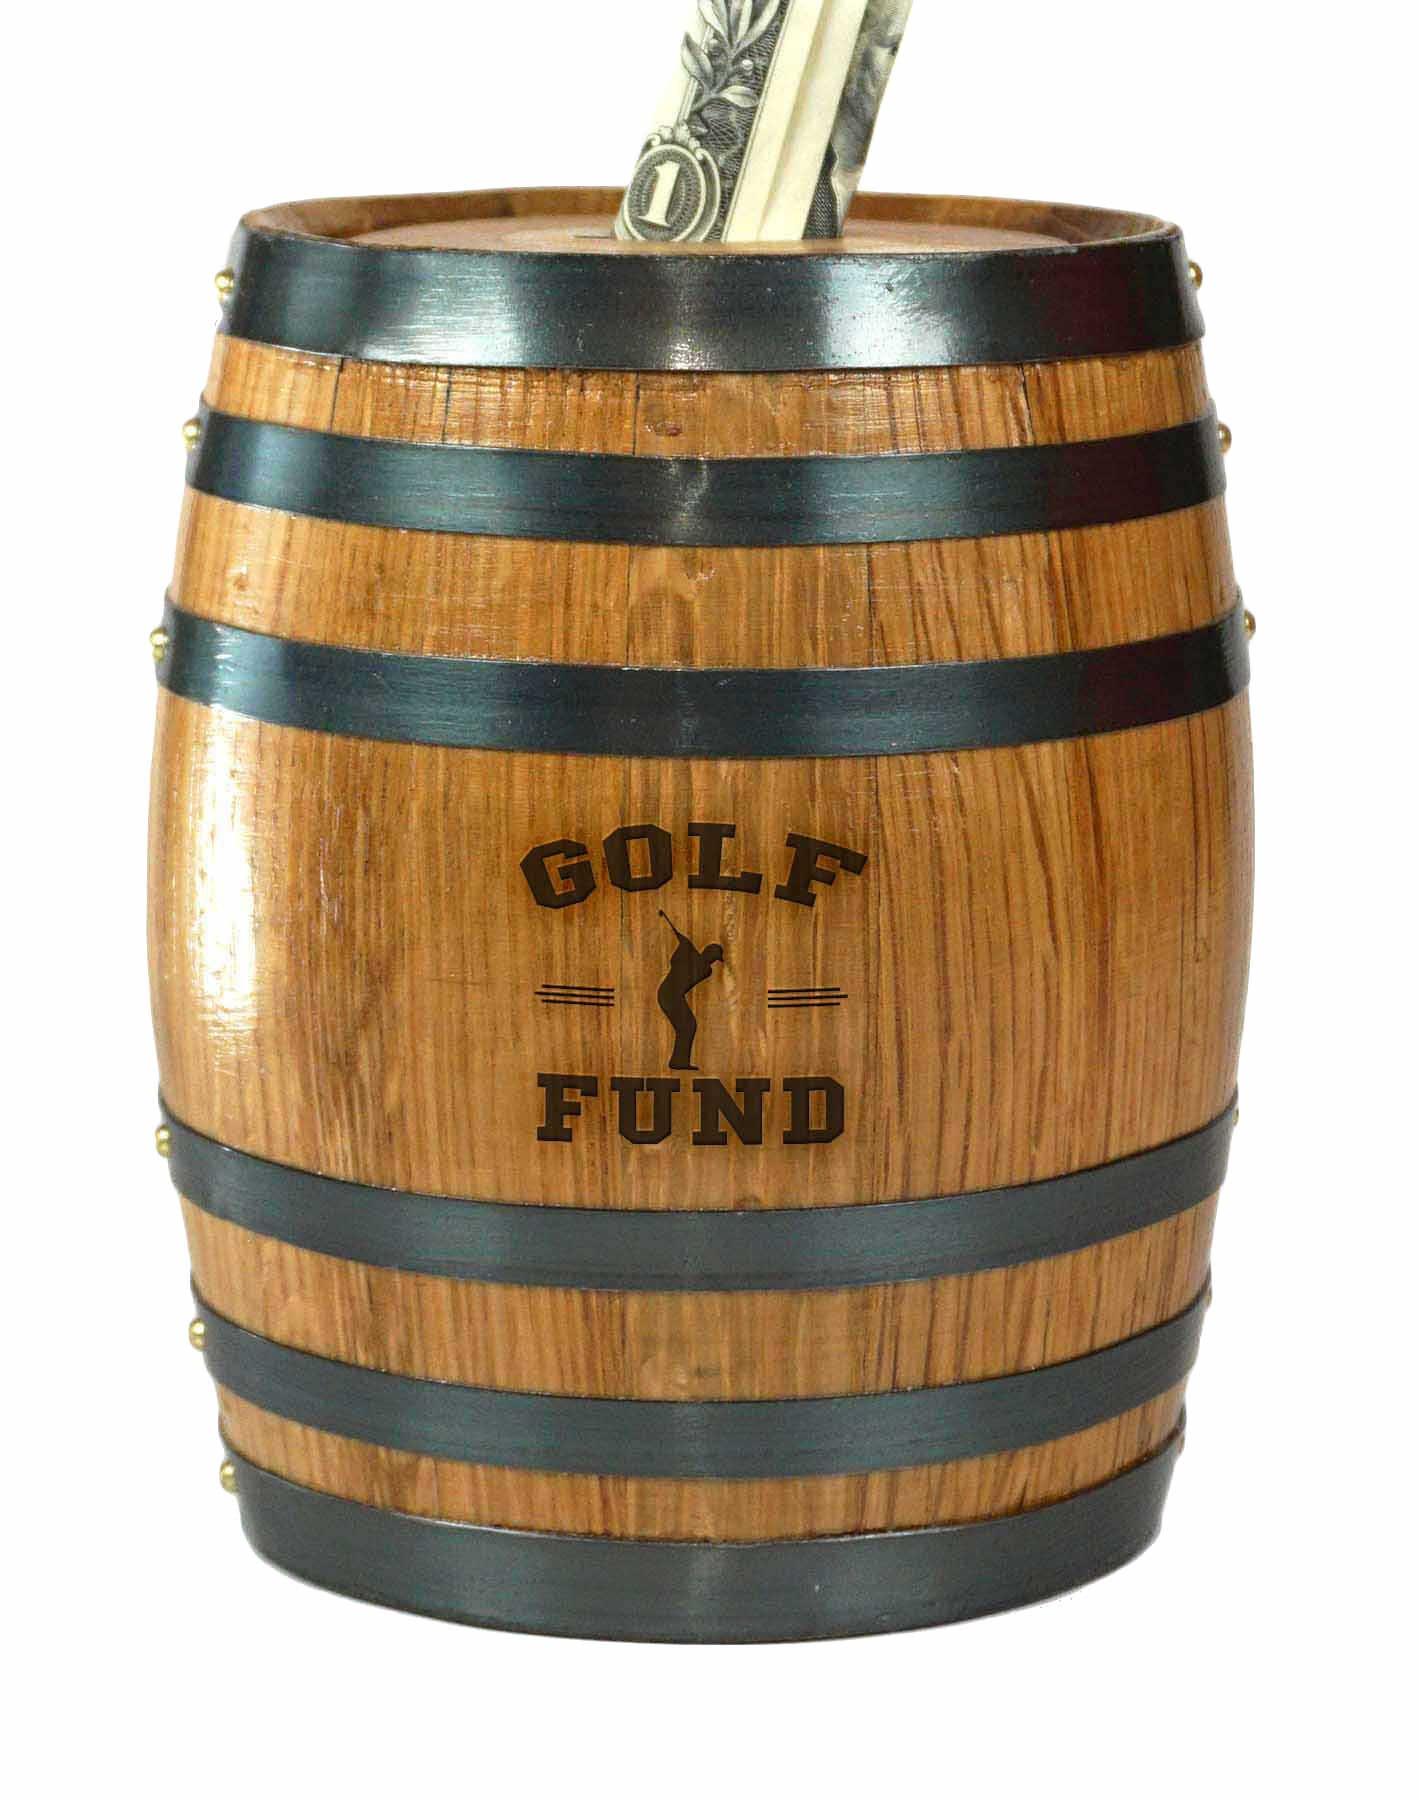 Mini Oak Barrel Piggy Bank Fund for Various Sports (Golf Fund) by THOUSAND OAKS BARREL